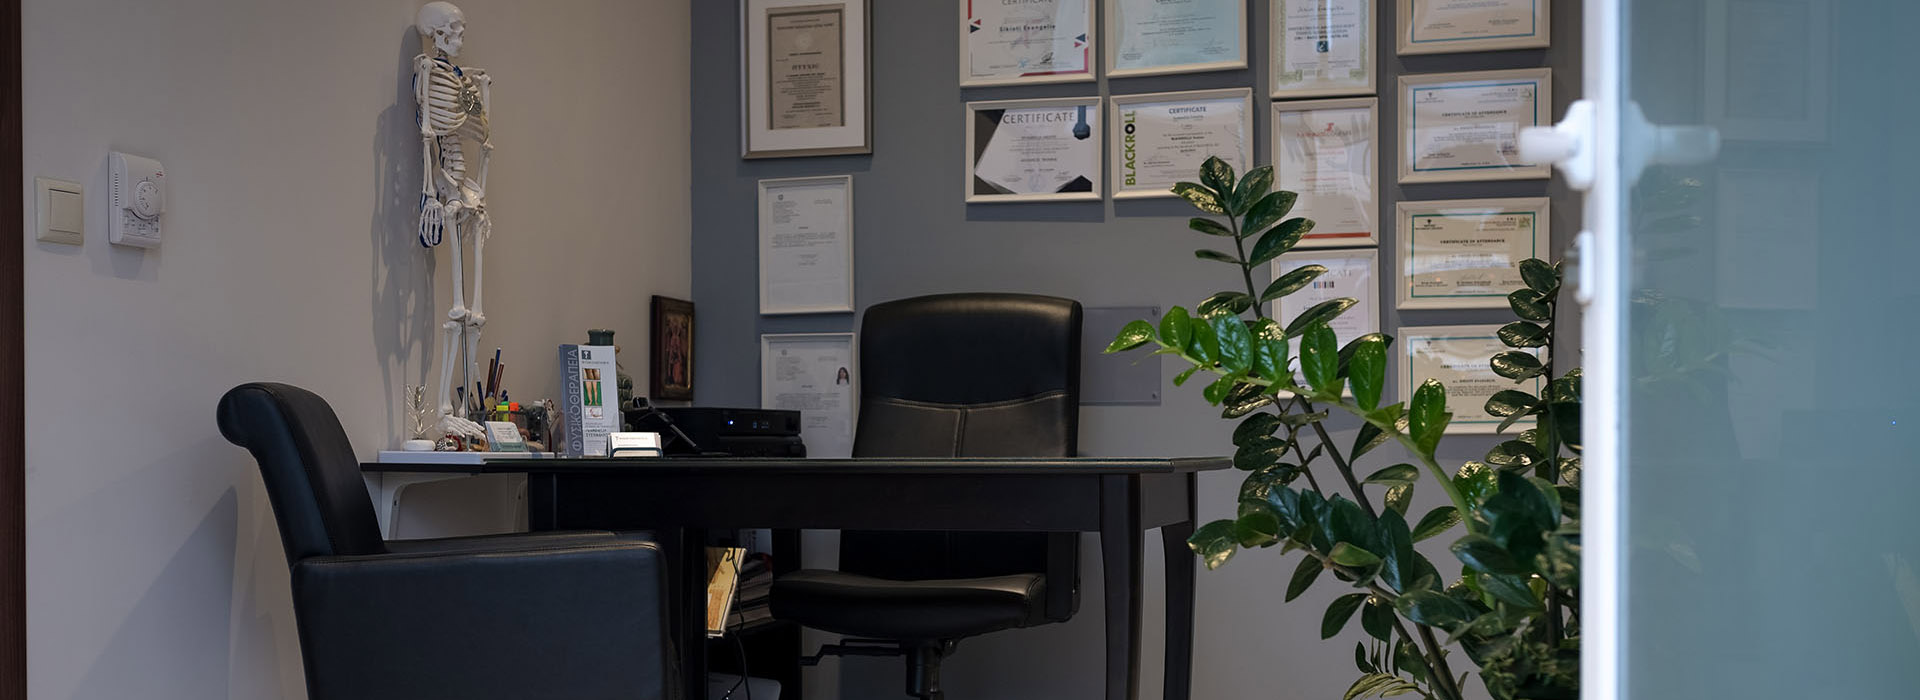 Healthy Recovery Λευκάδα Φυσικοθεραπευτήριο Υπηρεσίες Slider